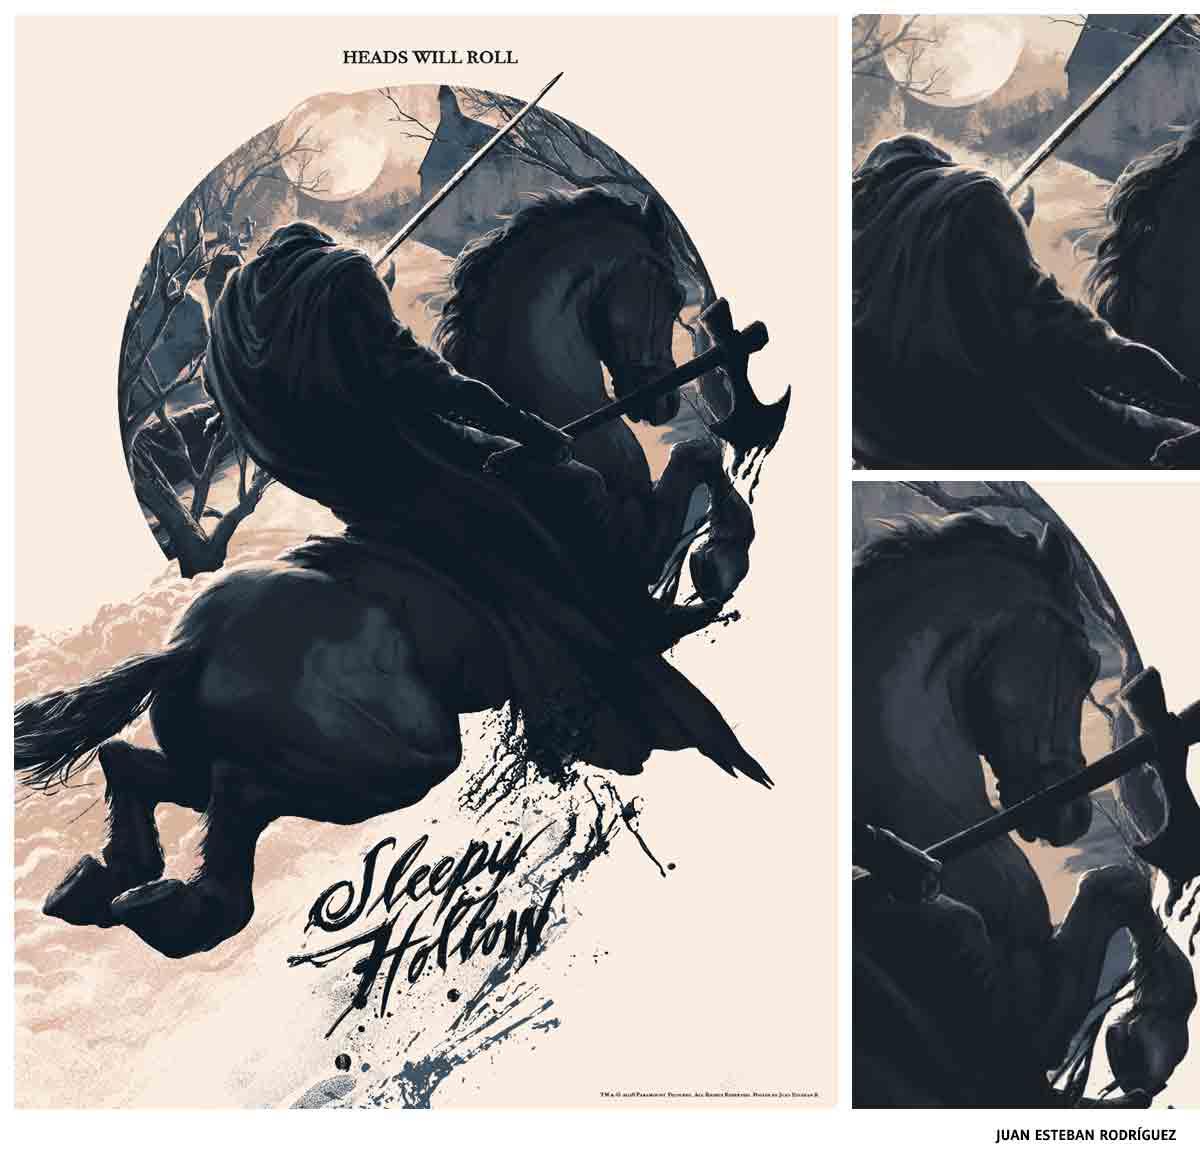 Juan Esteban Rodríguez Sleepy Hollow affiche sérigraphie